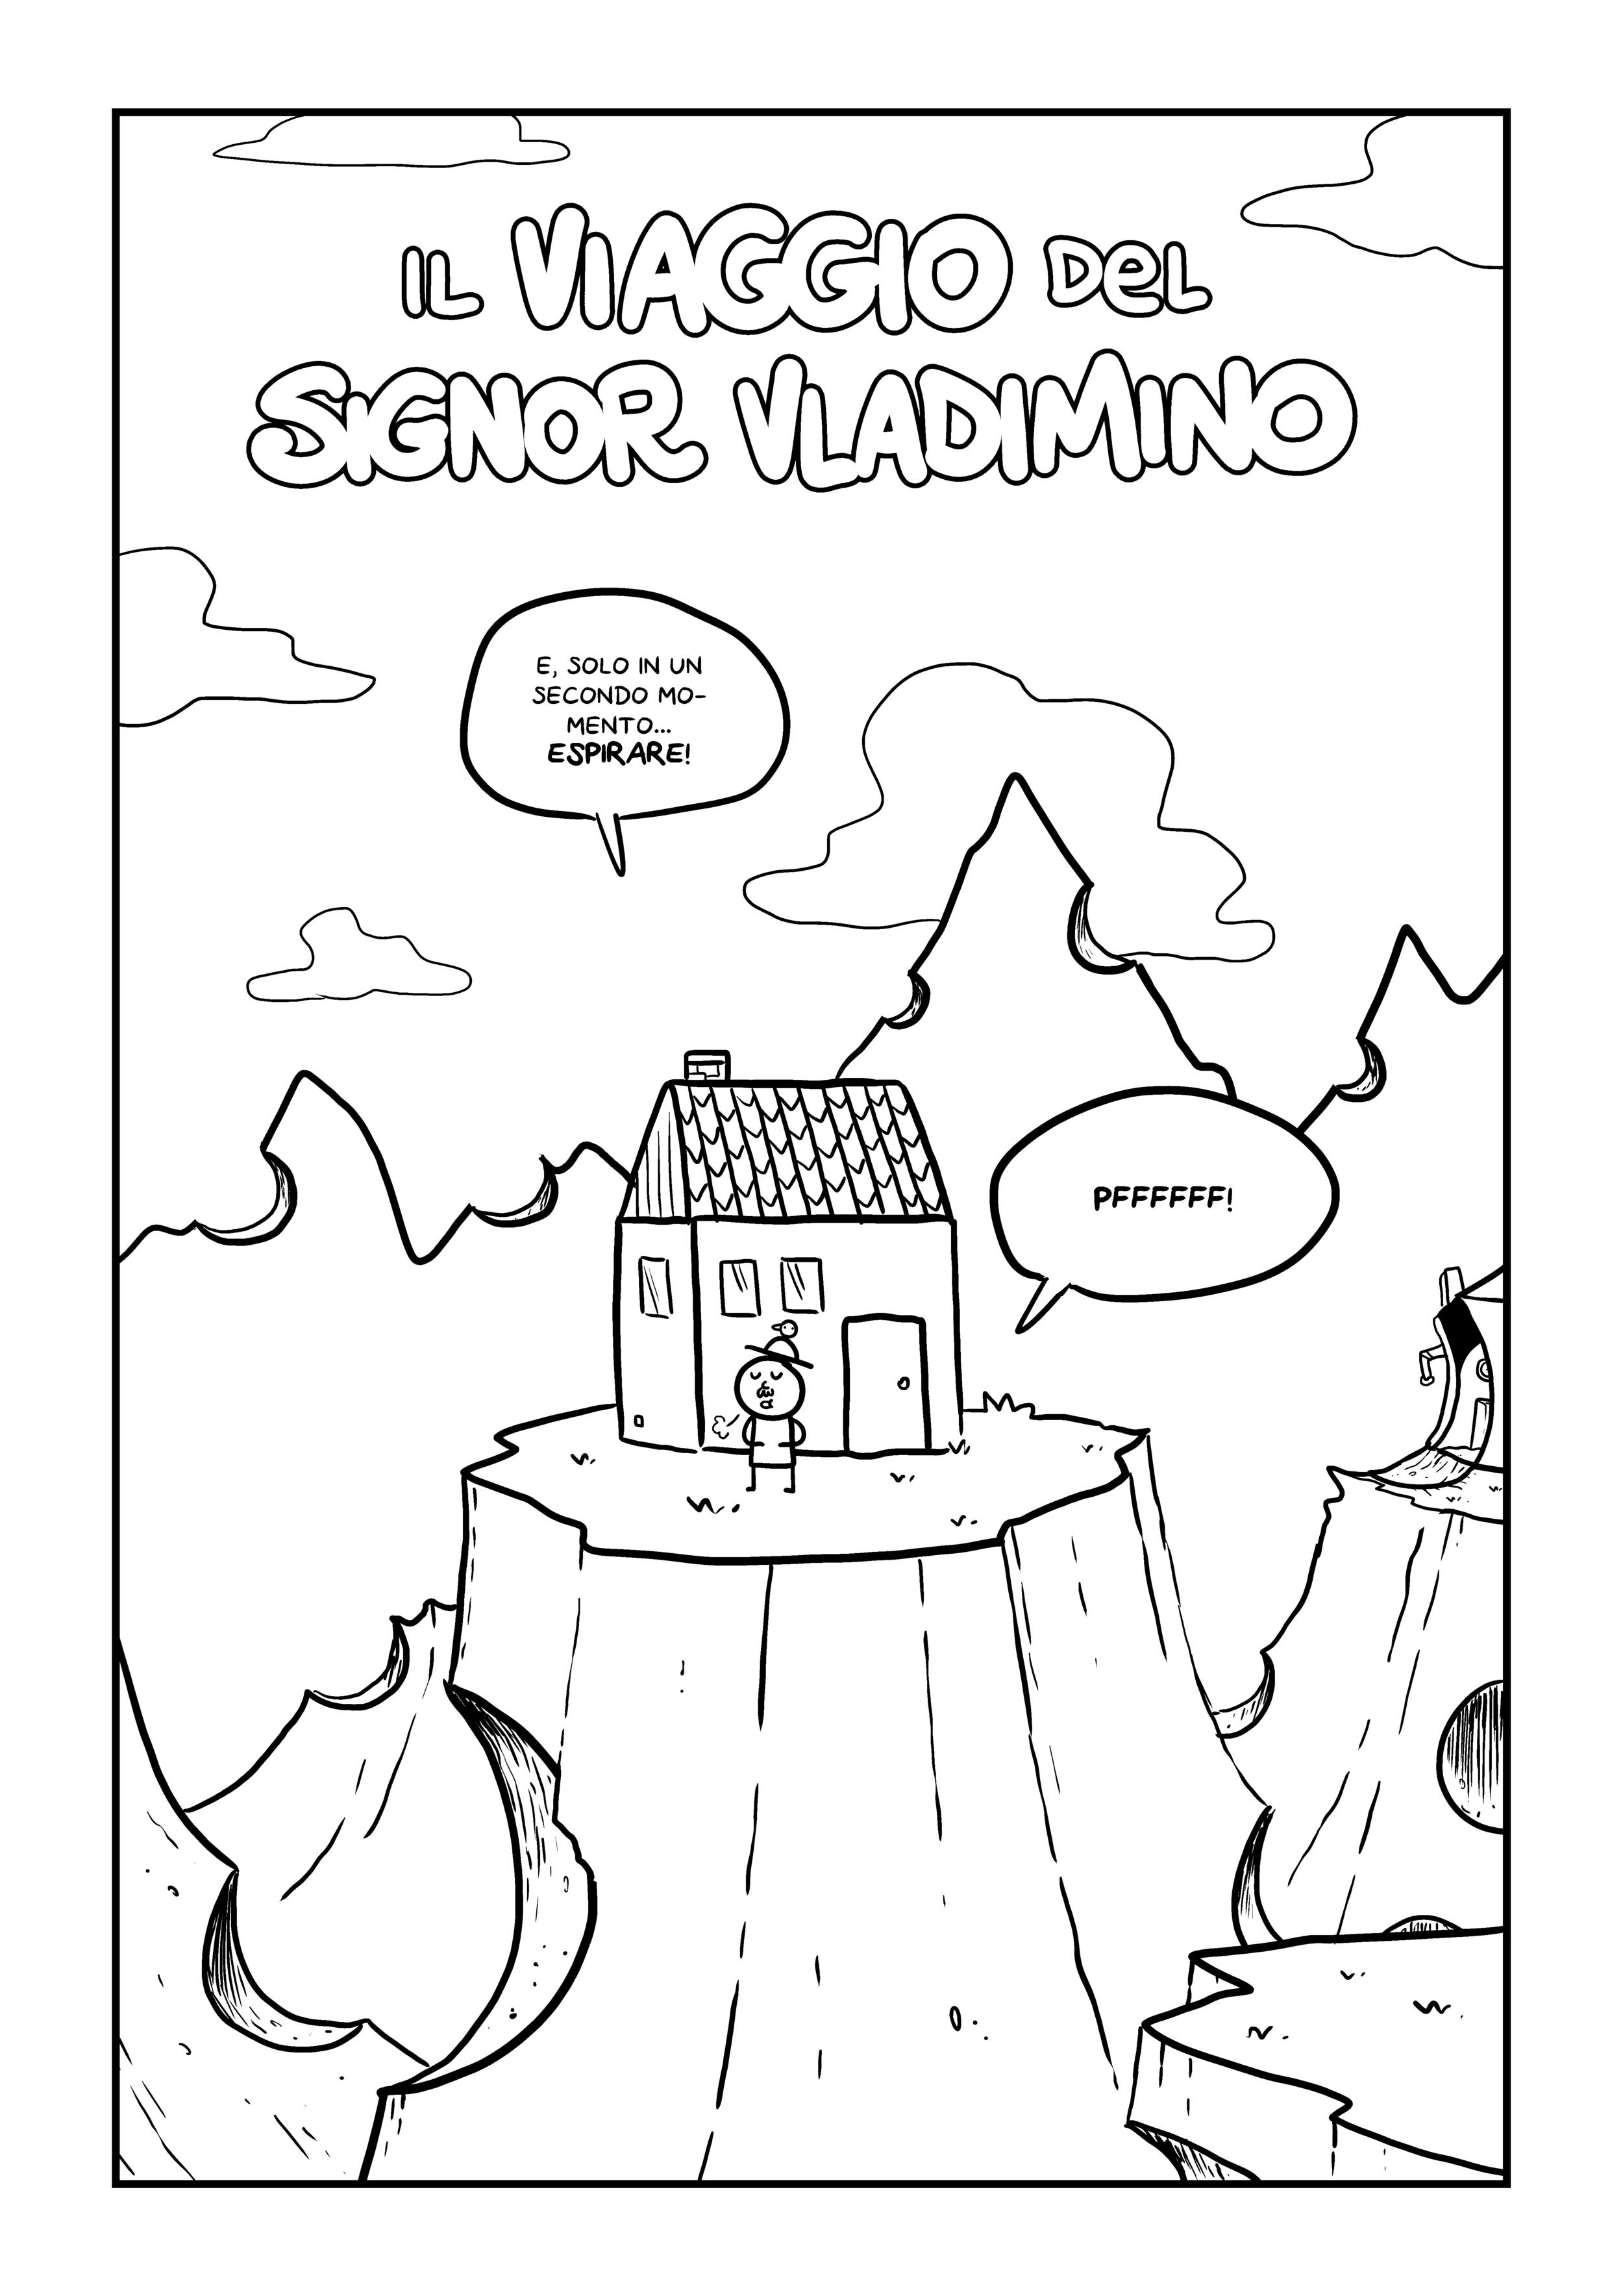 Vladimino_002.png